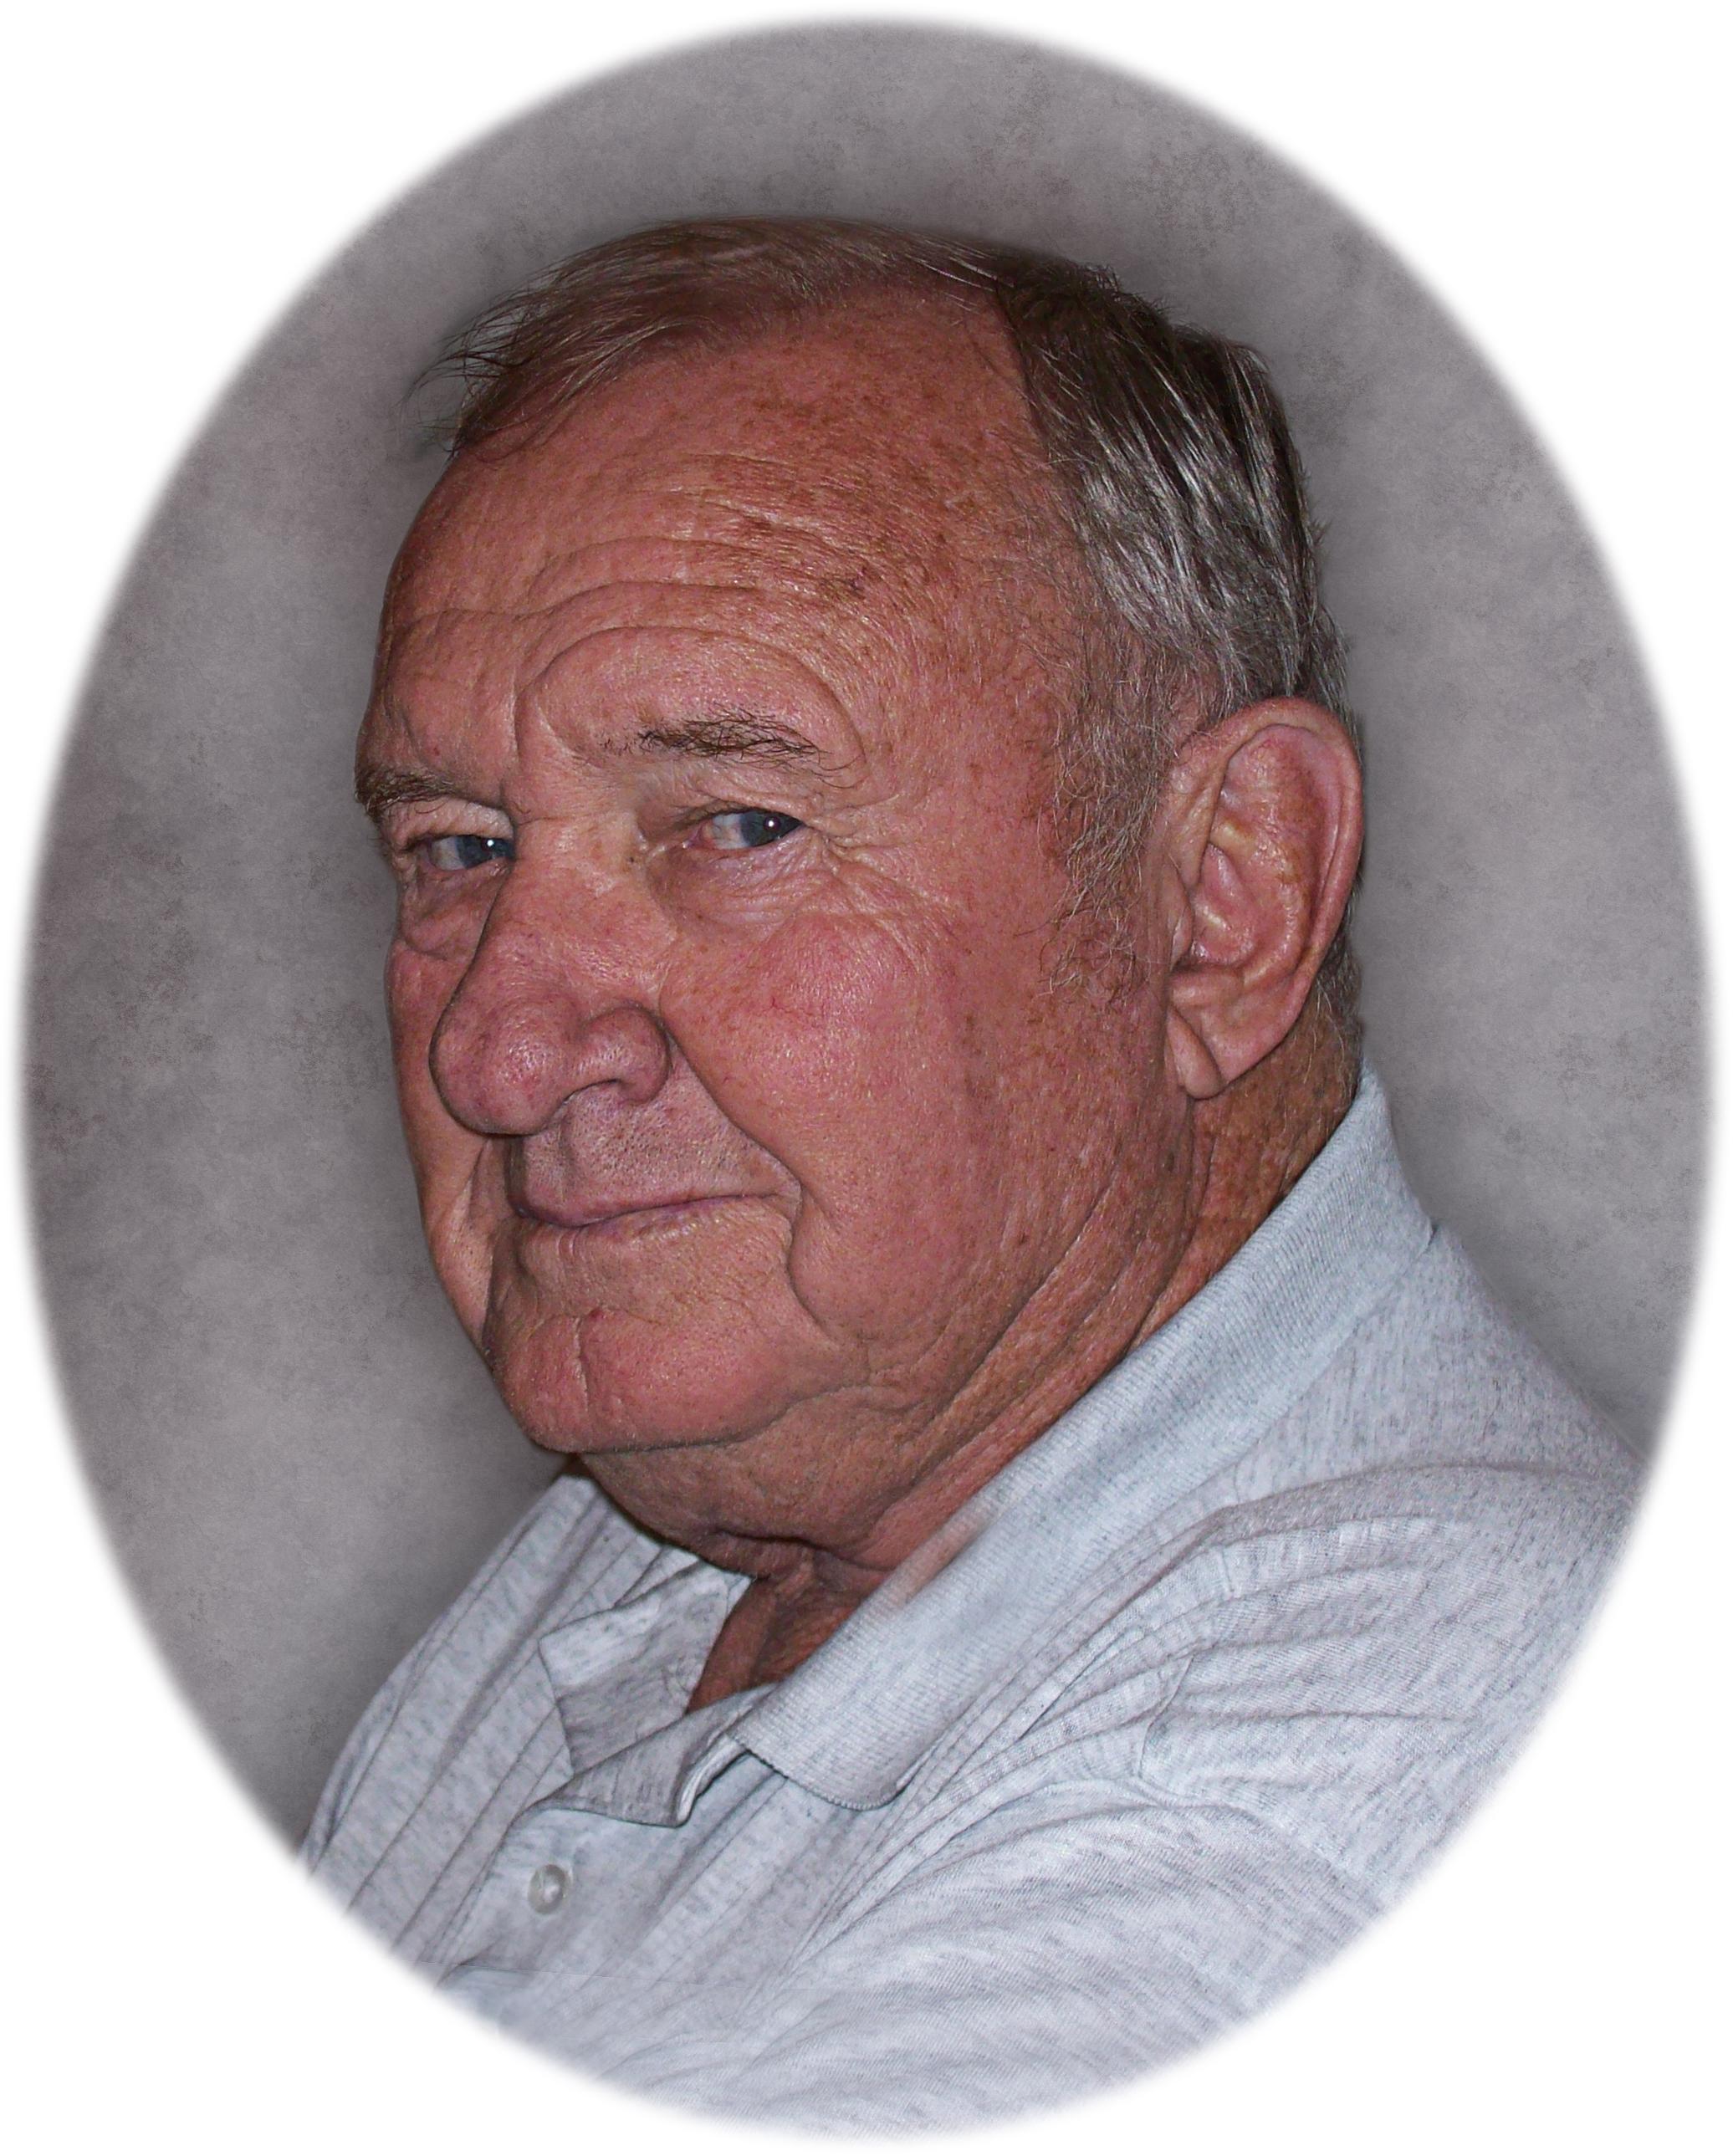 Phillip A. Mack